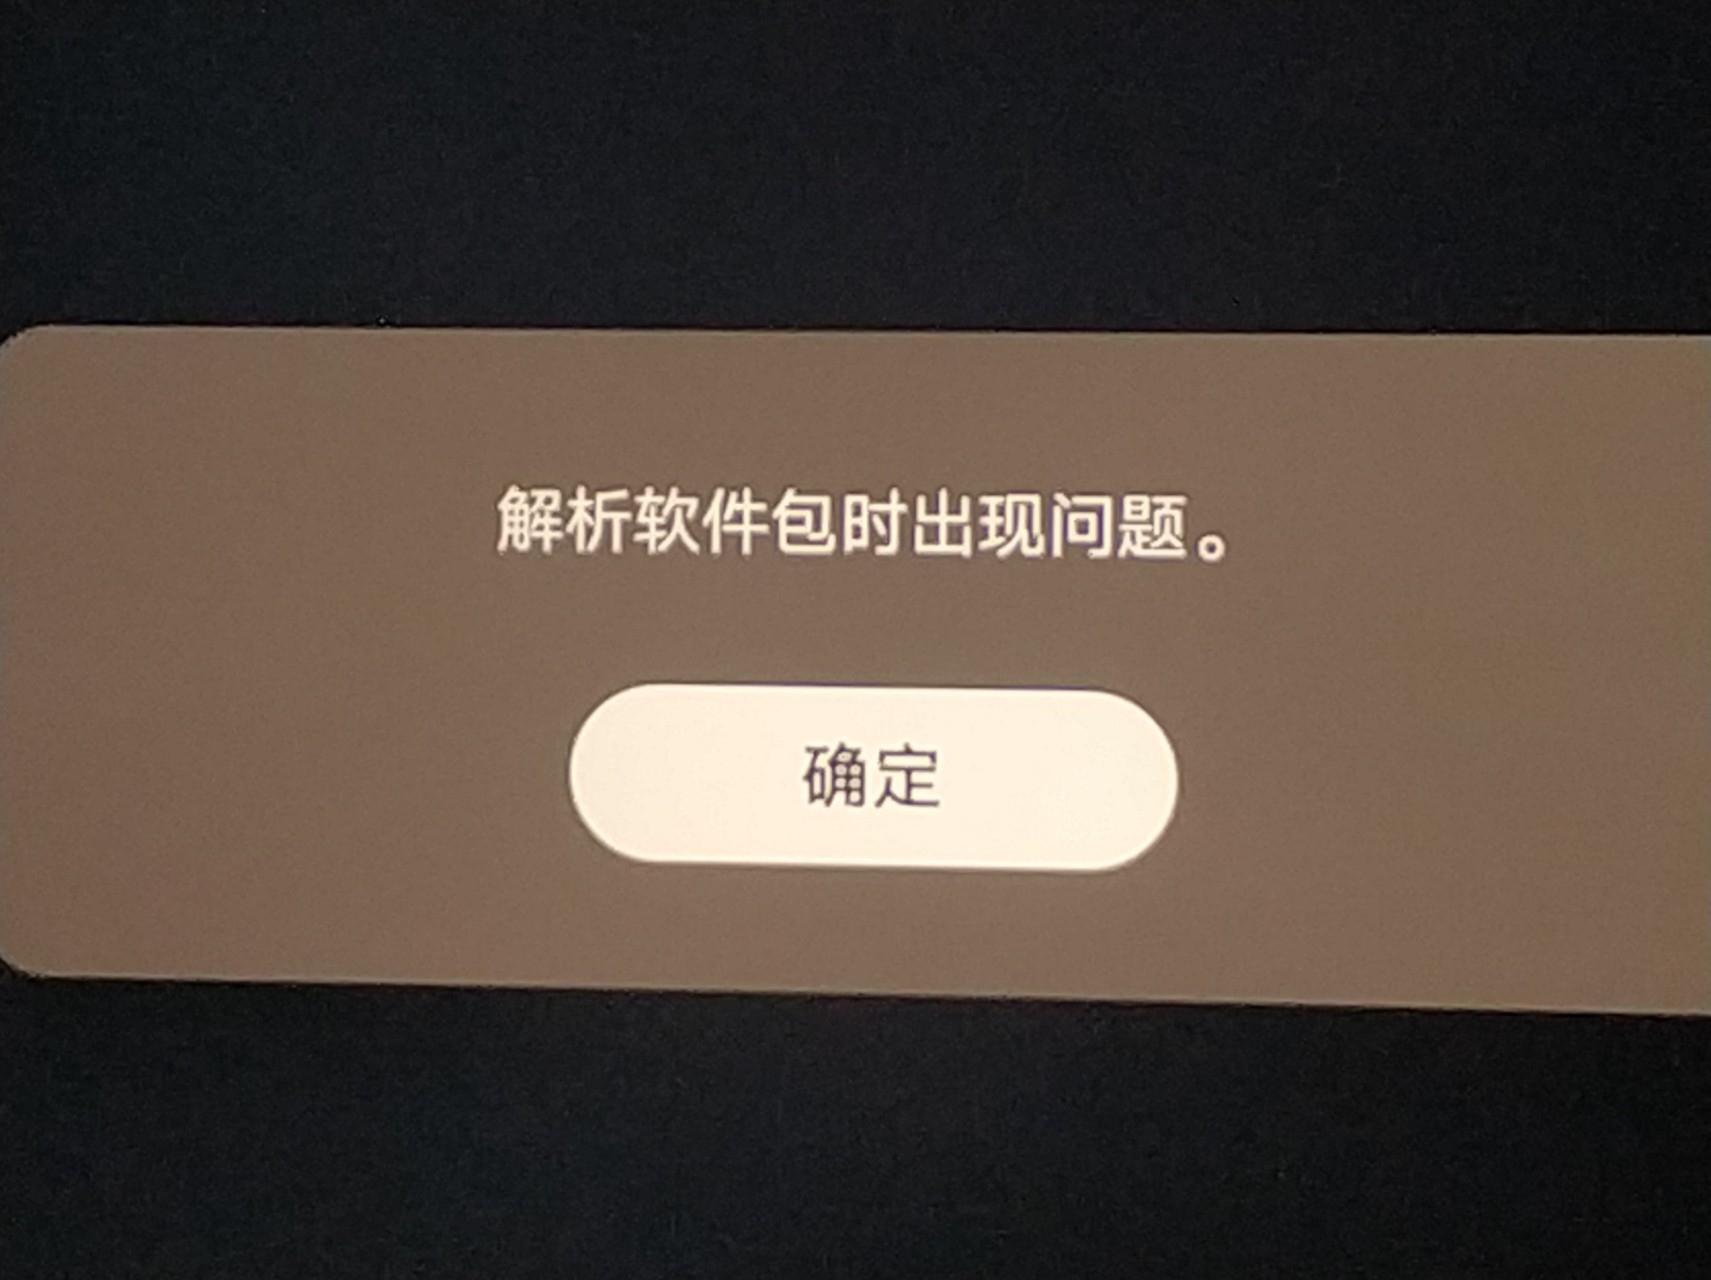 IMG_20200101_083525.jpg